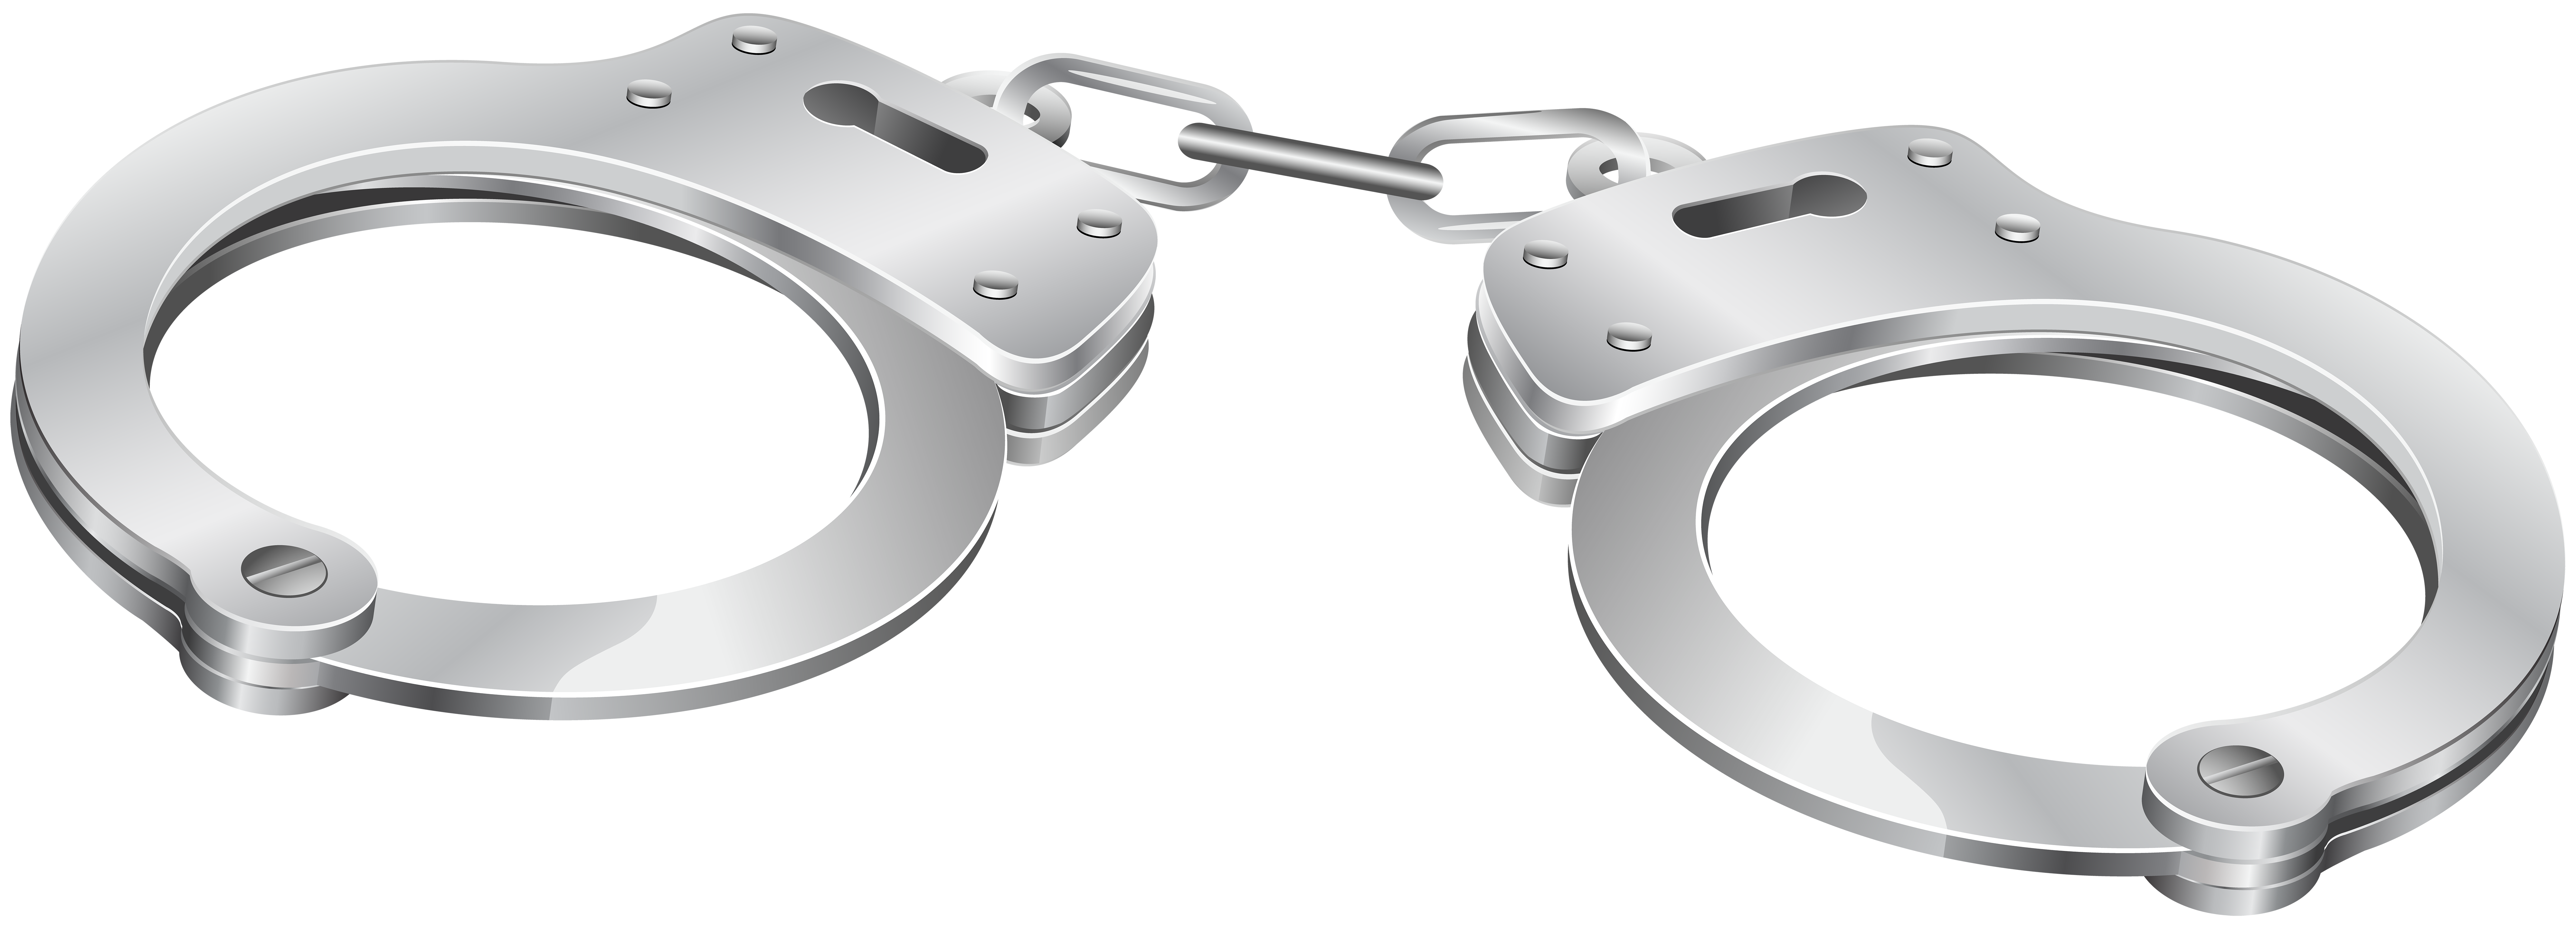 Handcuffs png clip art. Handcuff clipart transparent background